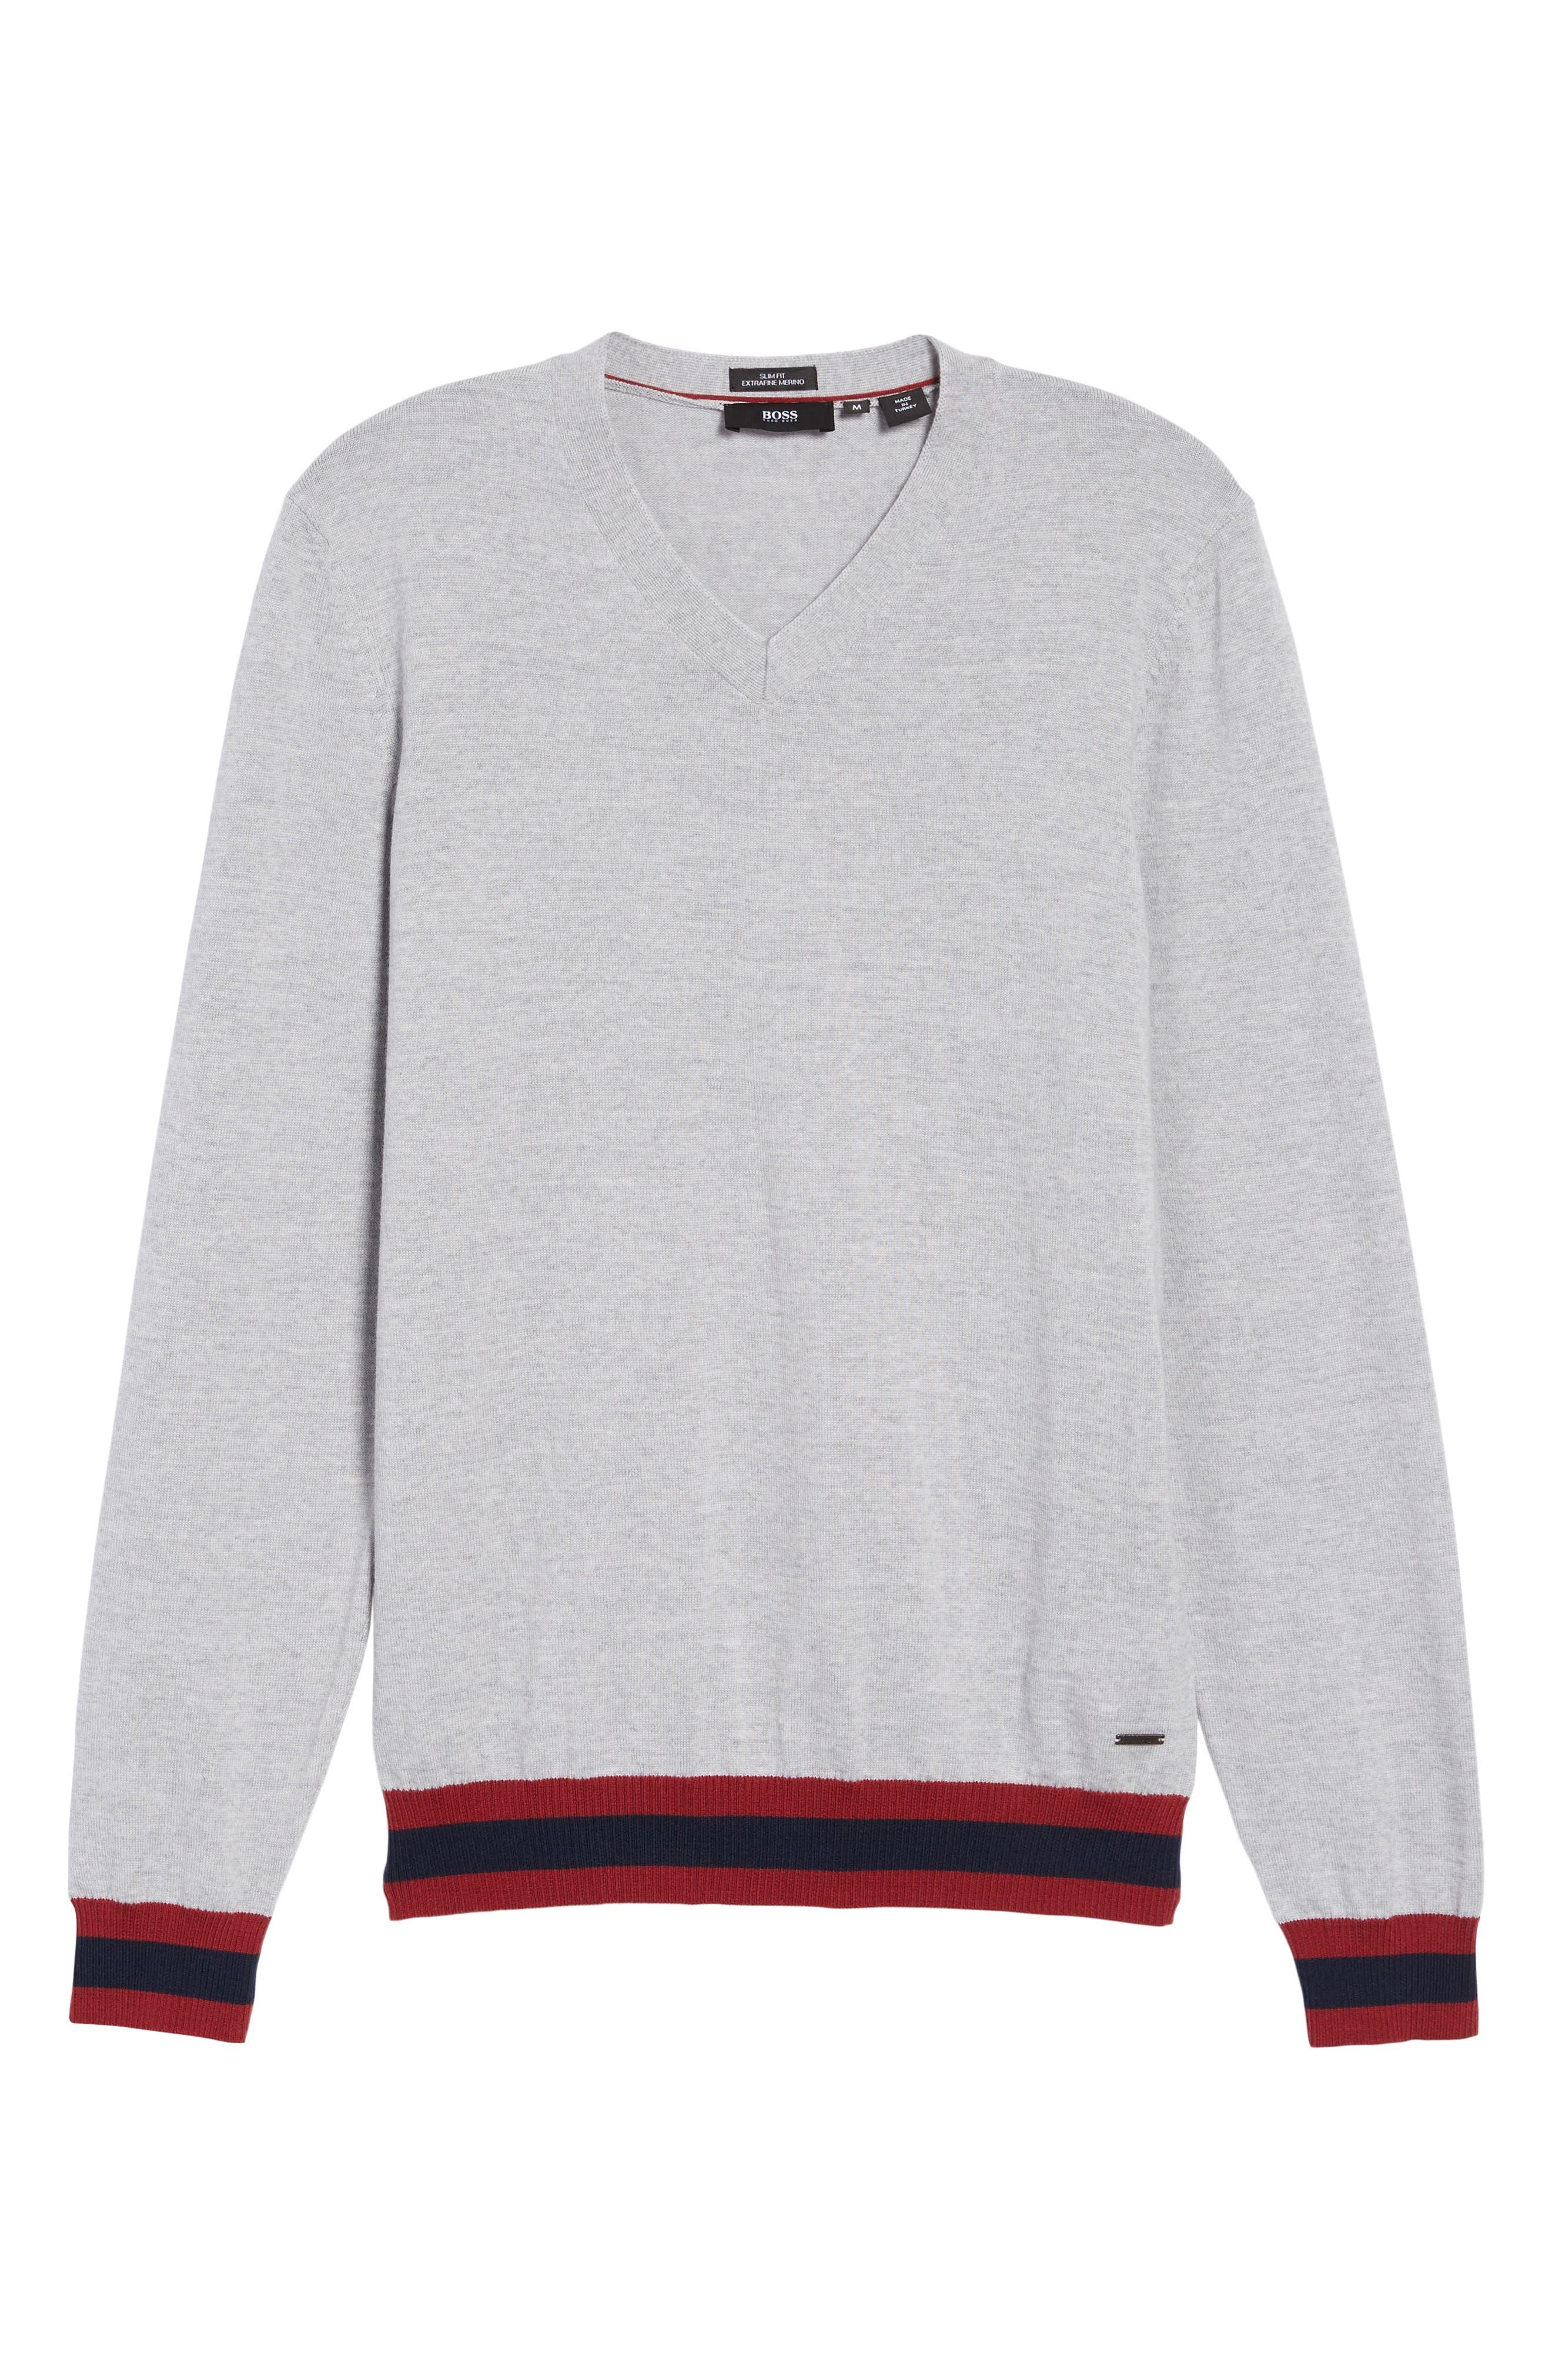 Navello Slim Fit Wool V-Neck Sweater,                             Alternate thumbnail 6, color,                             072